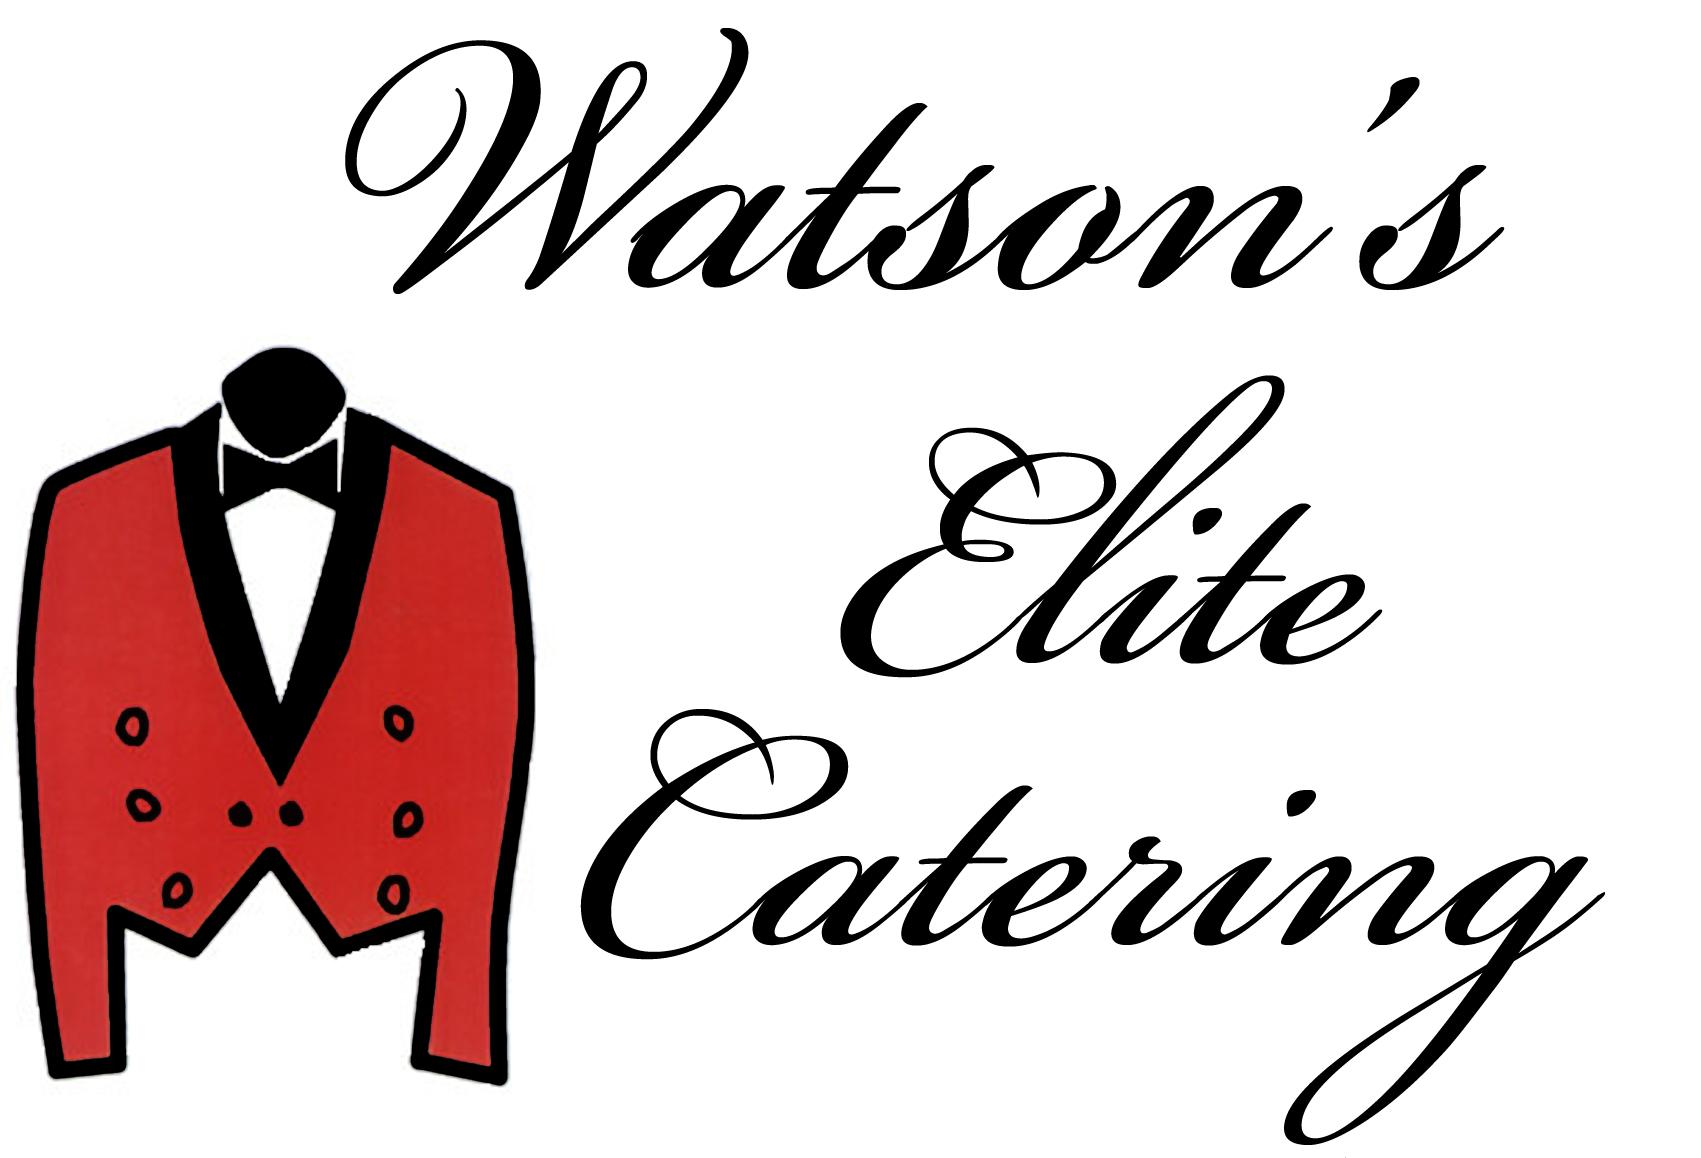 Watson's Elite Catering